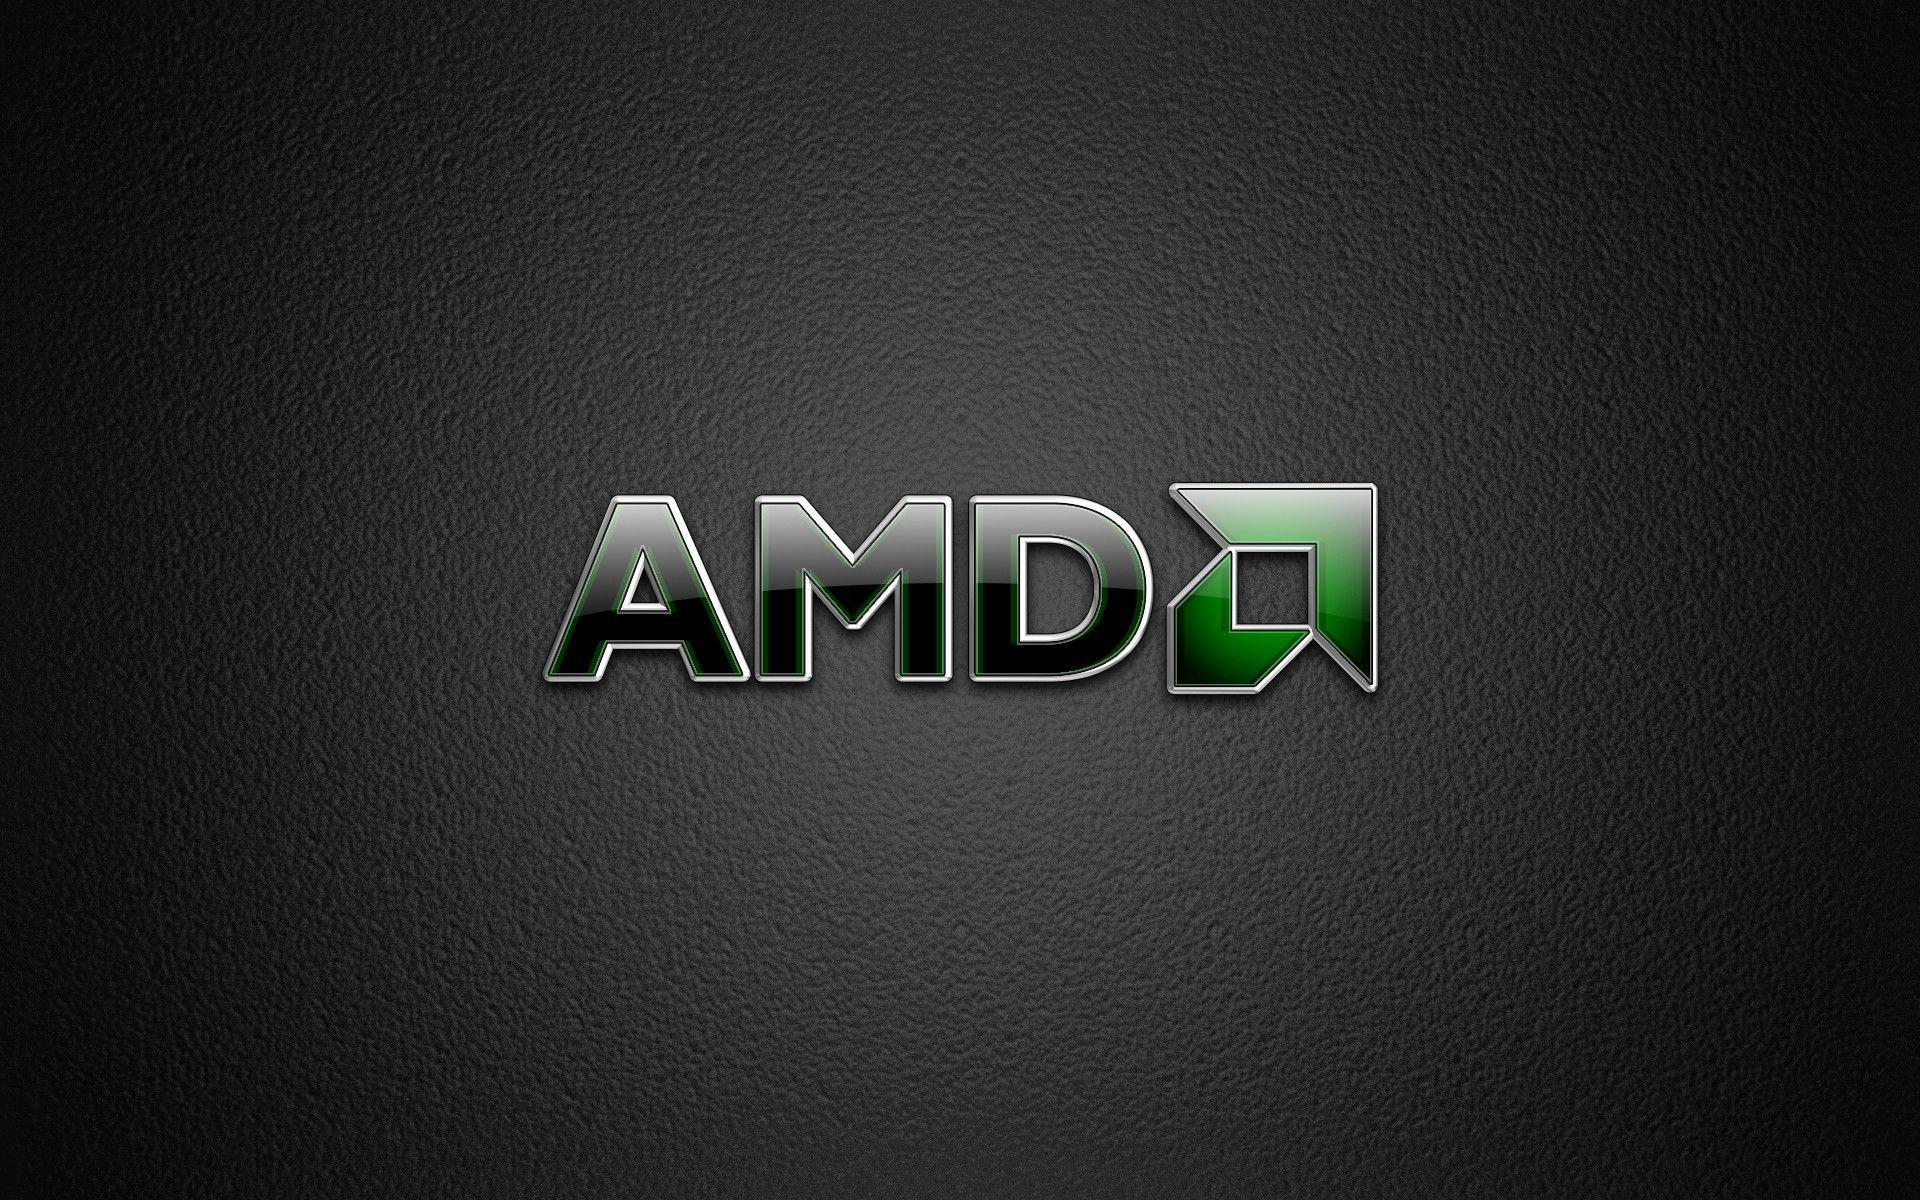 Amd Logo Wallpapers Top Free Amd Logo Backgrounds Wallpaperaccess